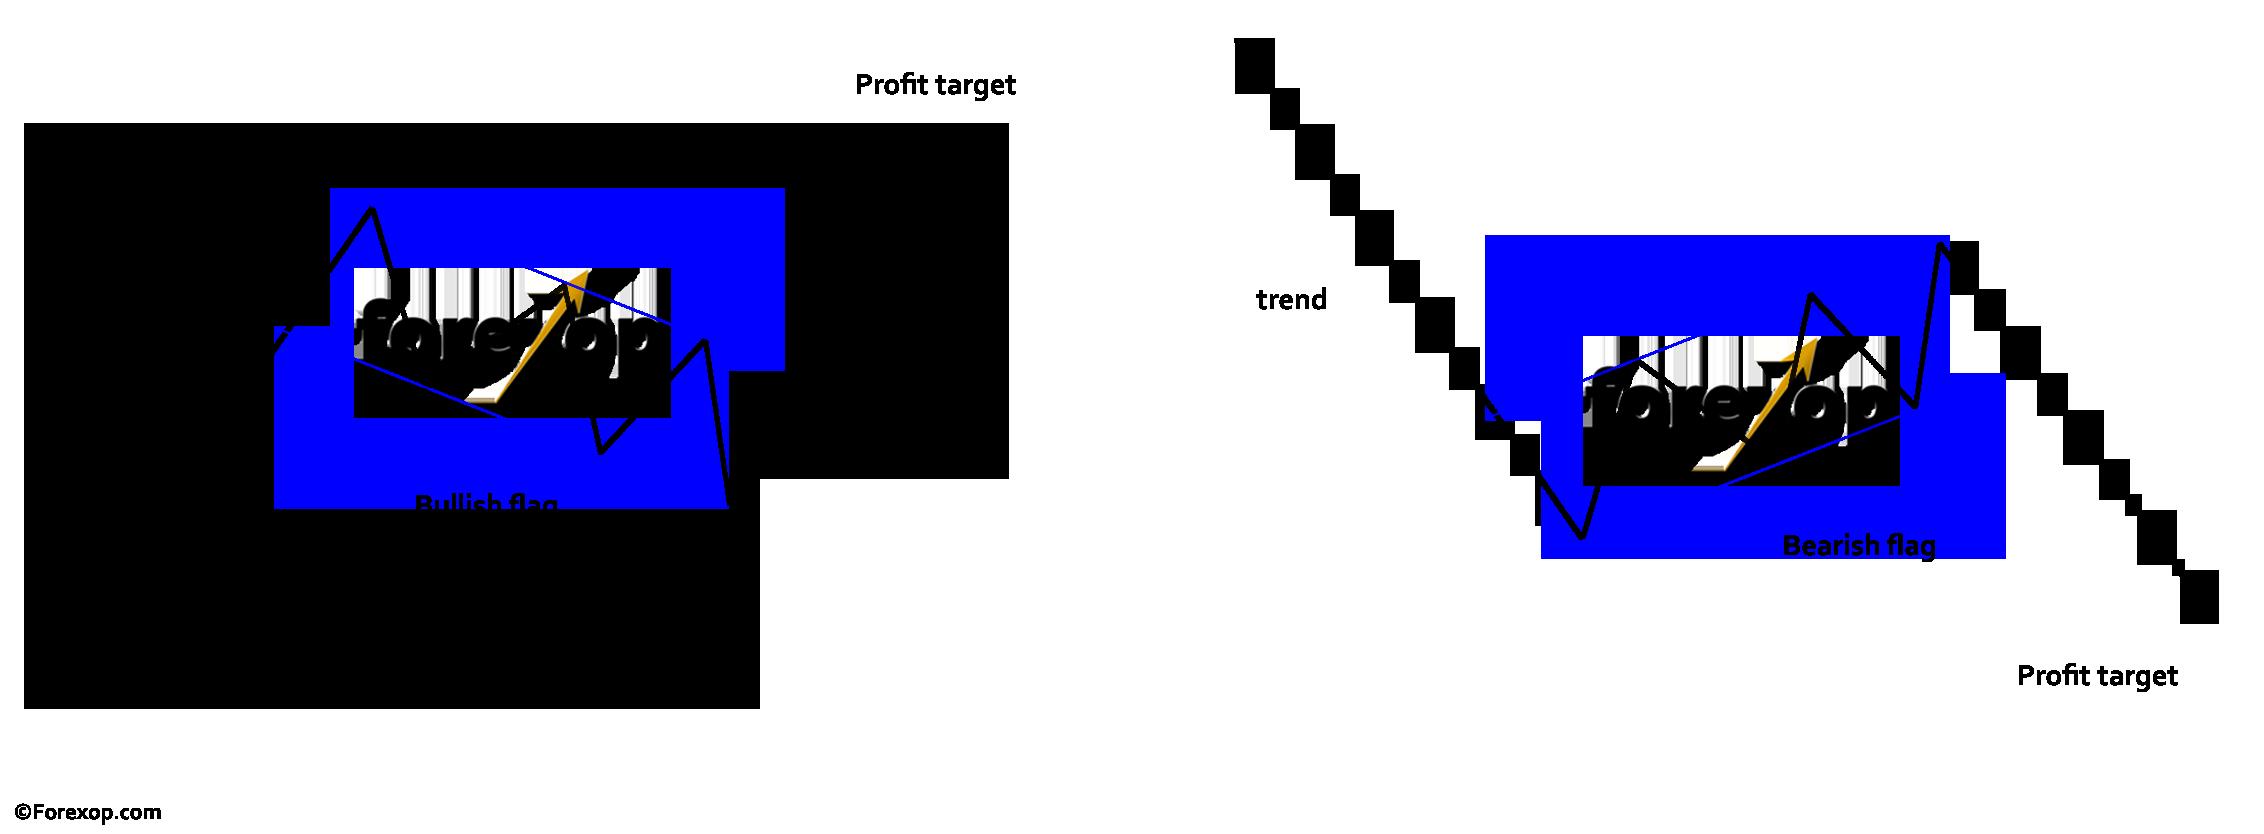 Figure 1: Bullish and bearish flag prototypes